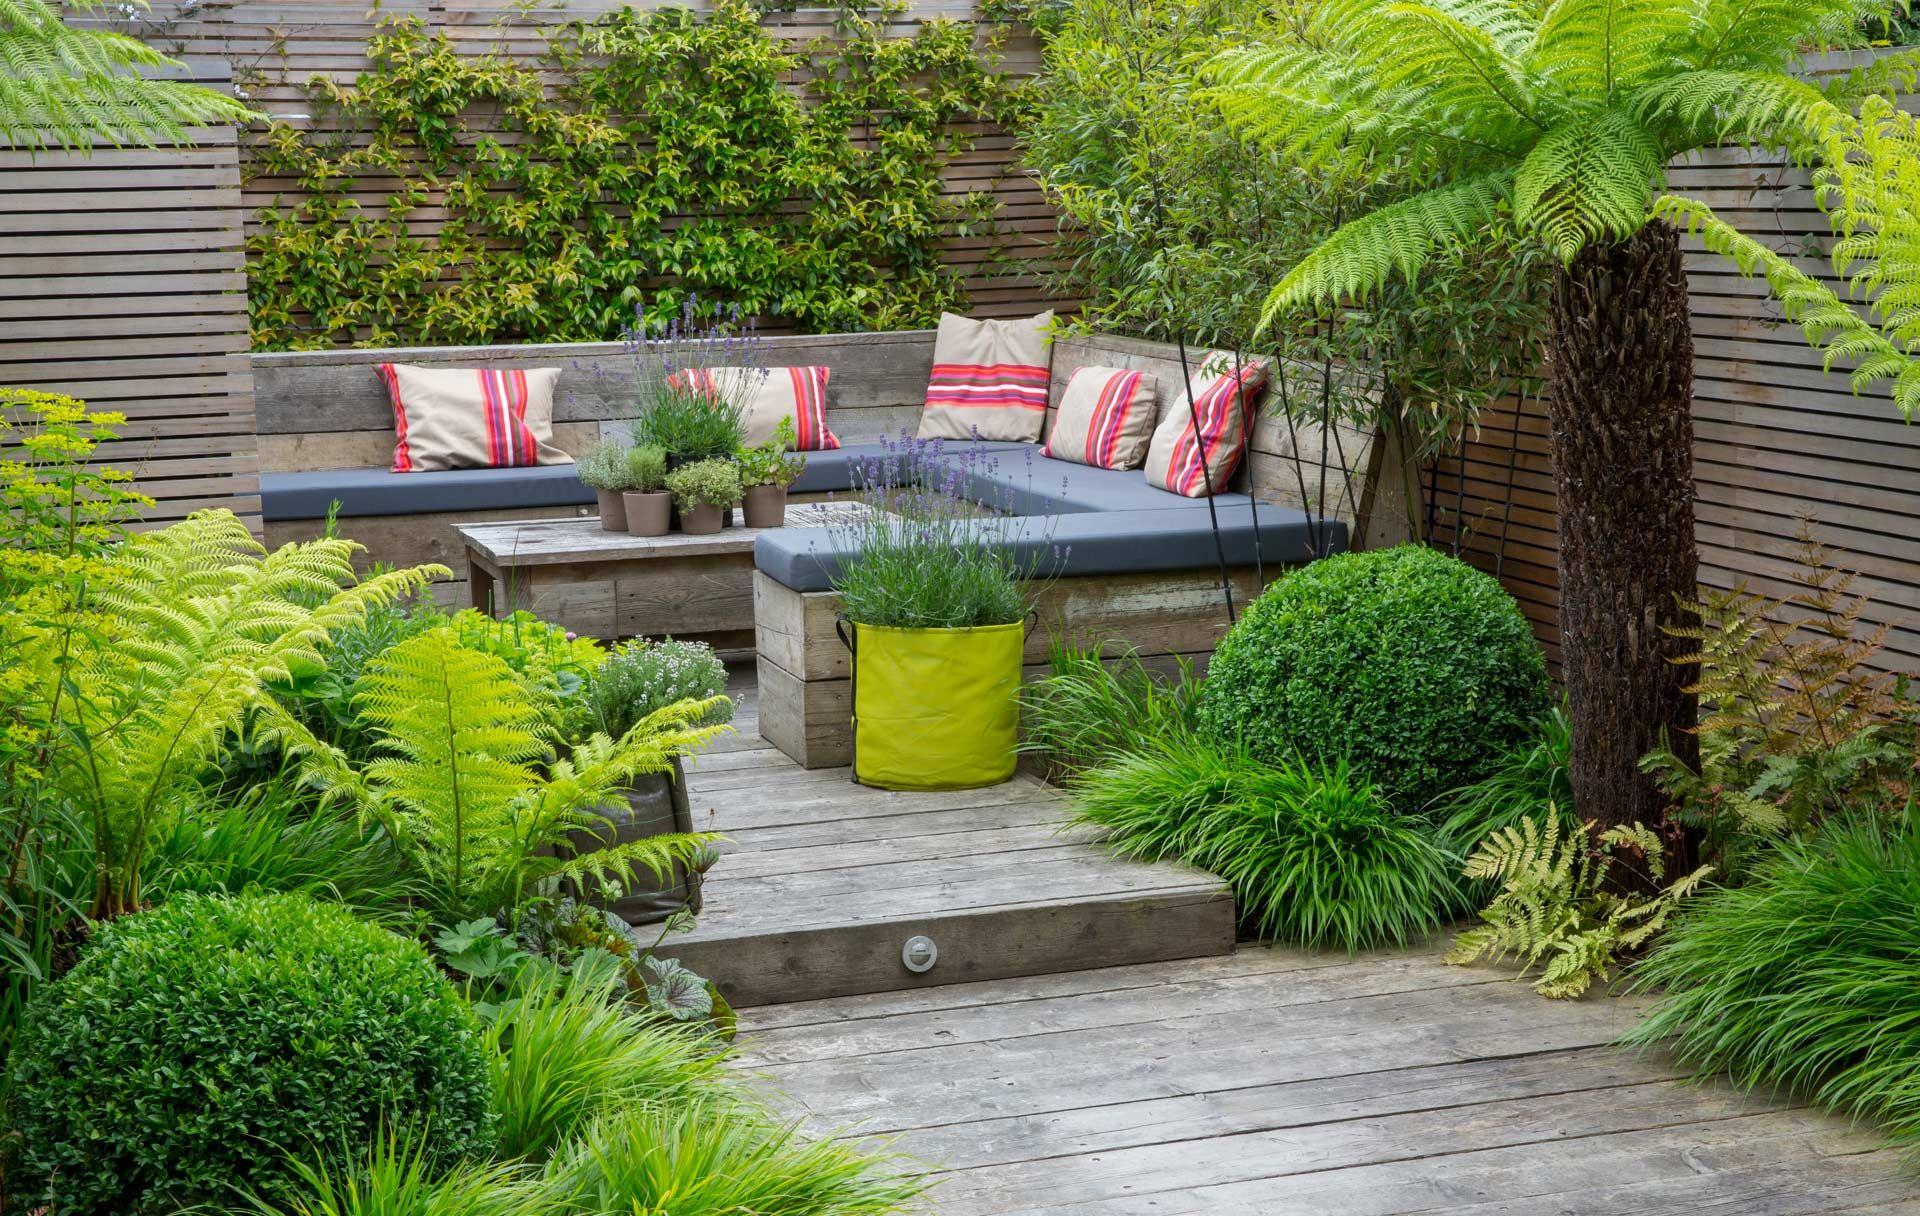 Richmond  Oasis - Garden Club London  Urban garden design